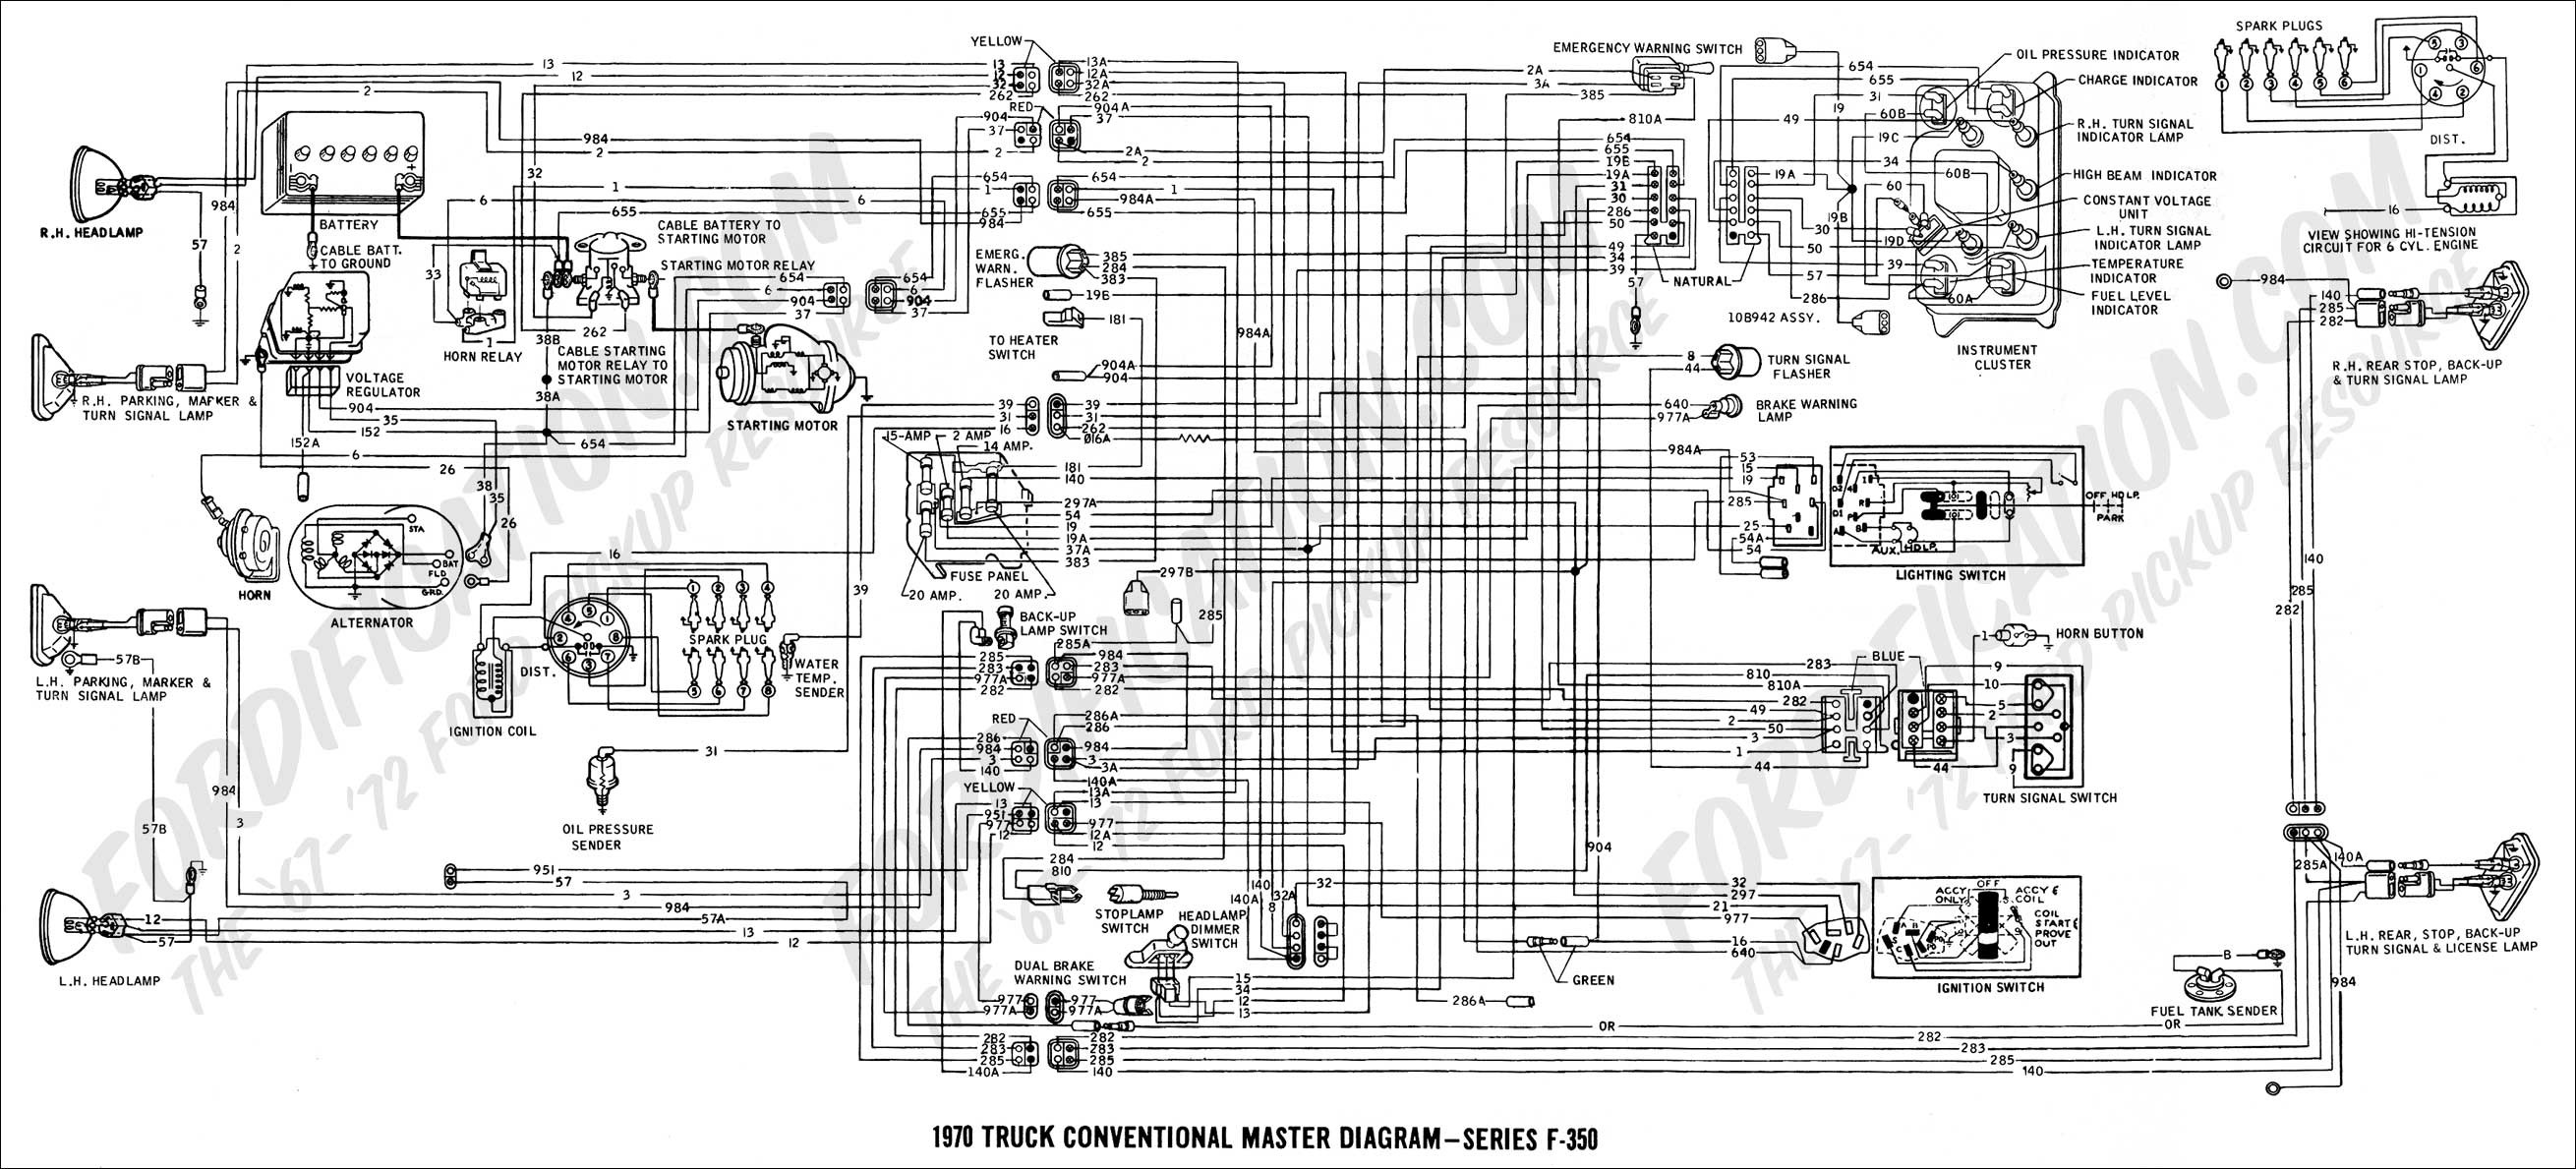 2006 Ford Ranger Wiring Diagram 3